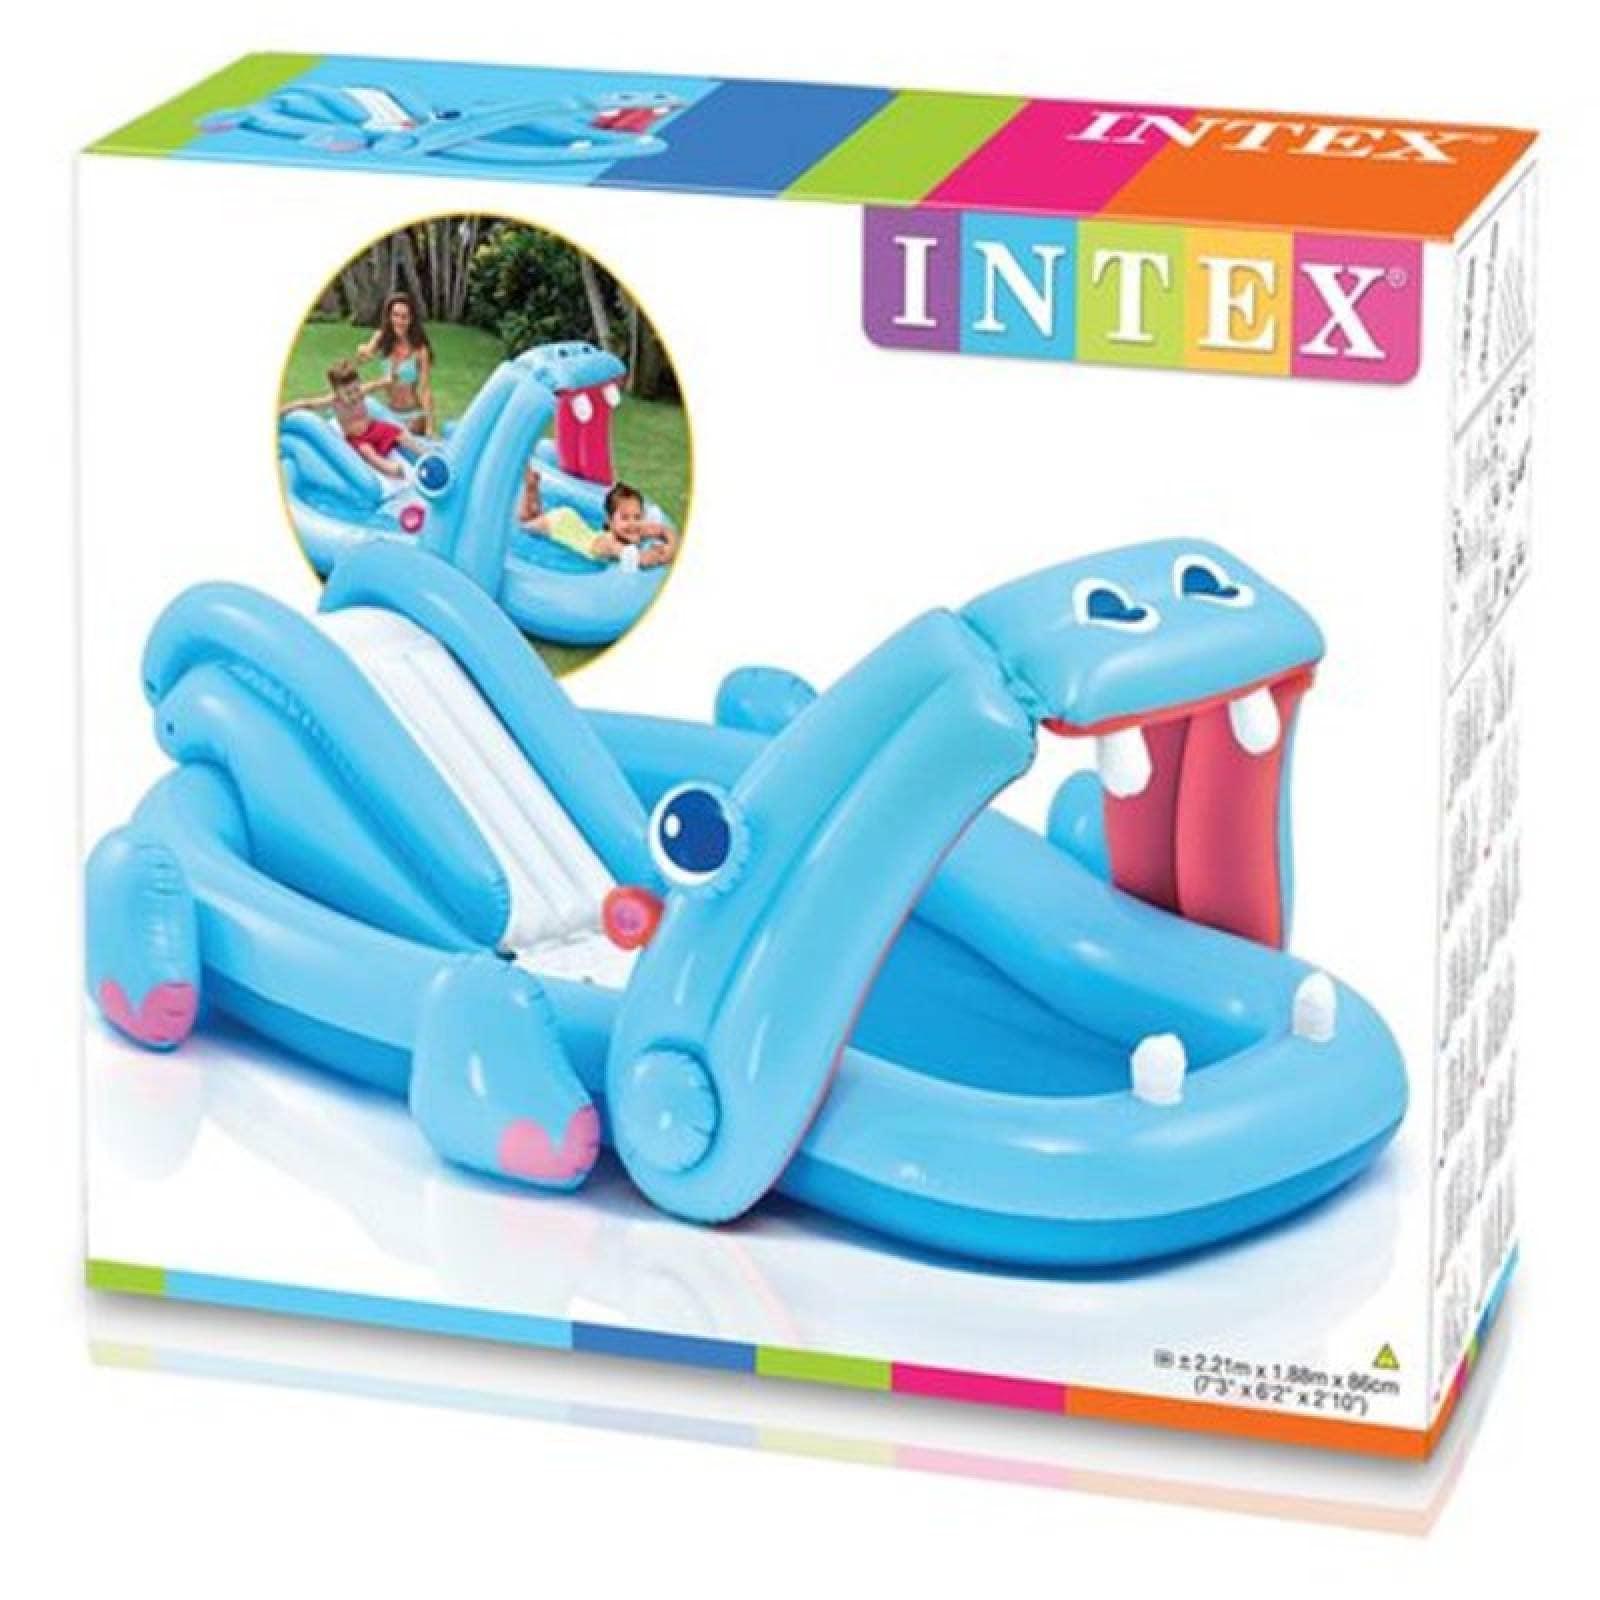 Inflable Hippo Con Tobogan 221 X 188 X 86 Cm Intex